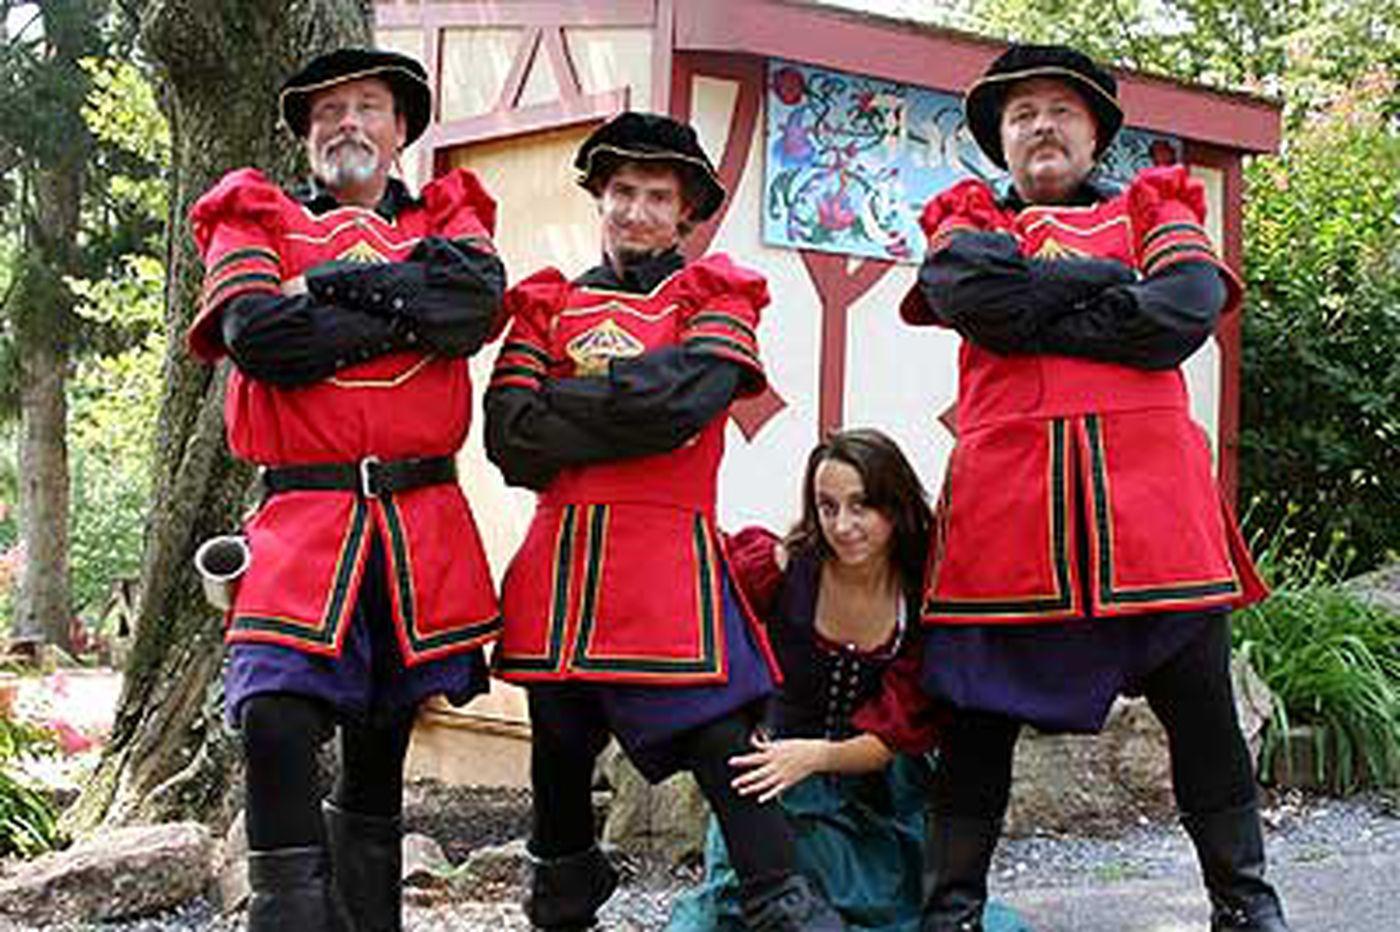 Weekend Planner: Manly Medieval men, more